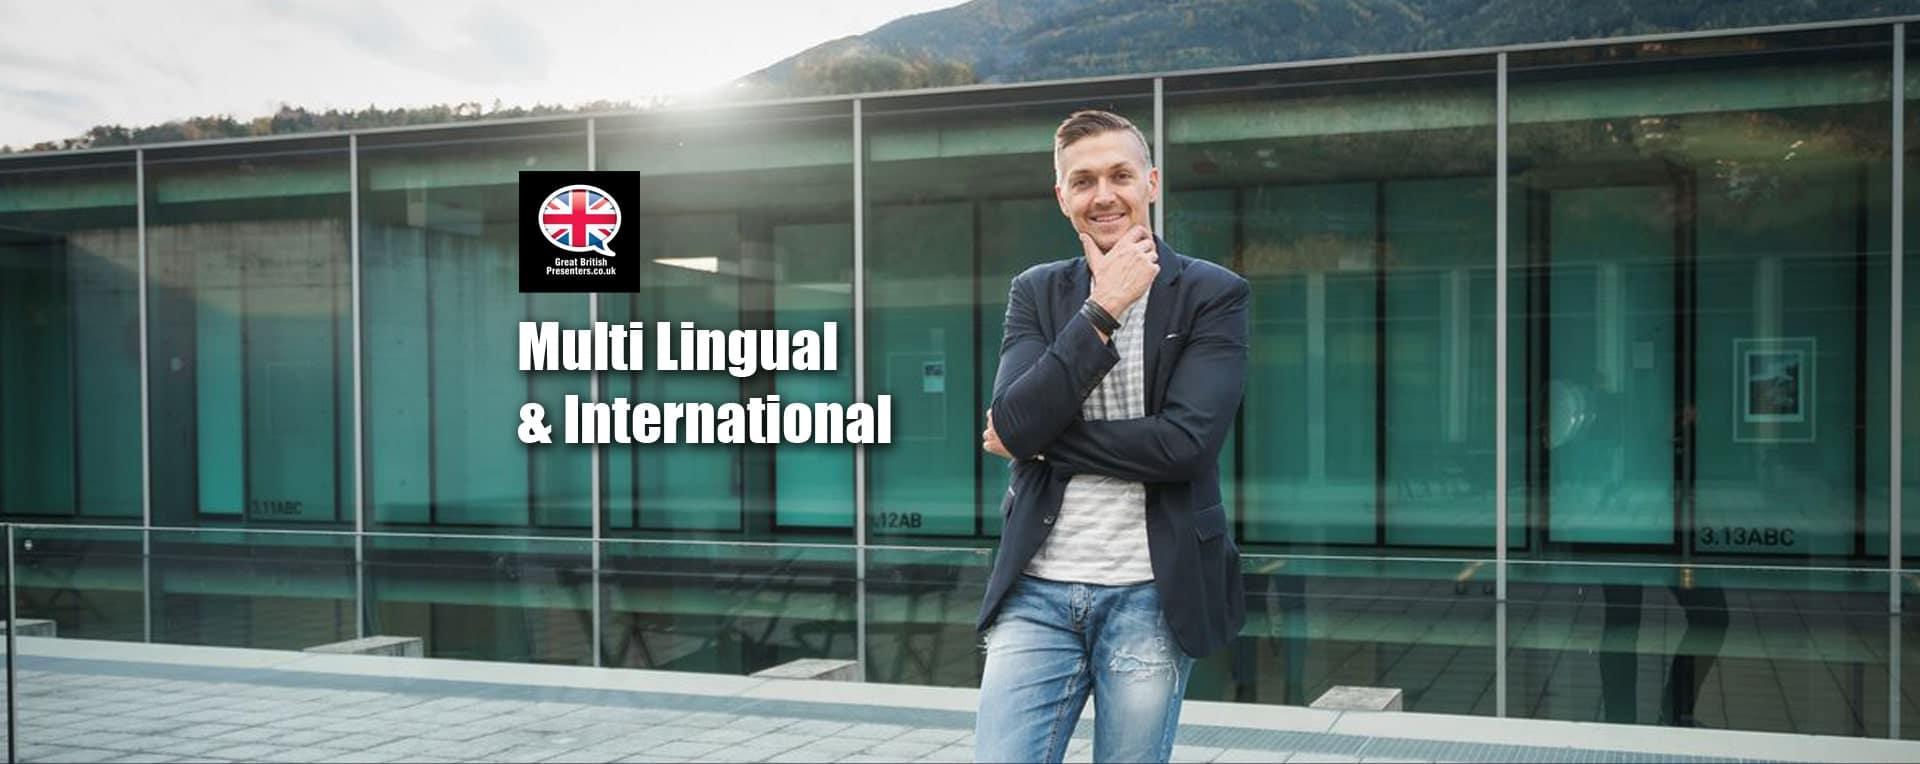 Multi Lingual International language expert hosts media professionals worldwide Europe USA at Great British Presenters-min